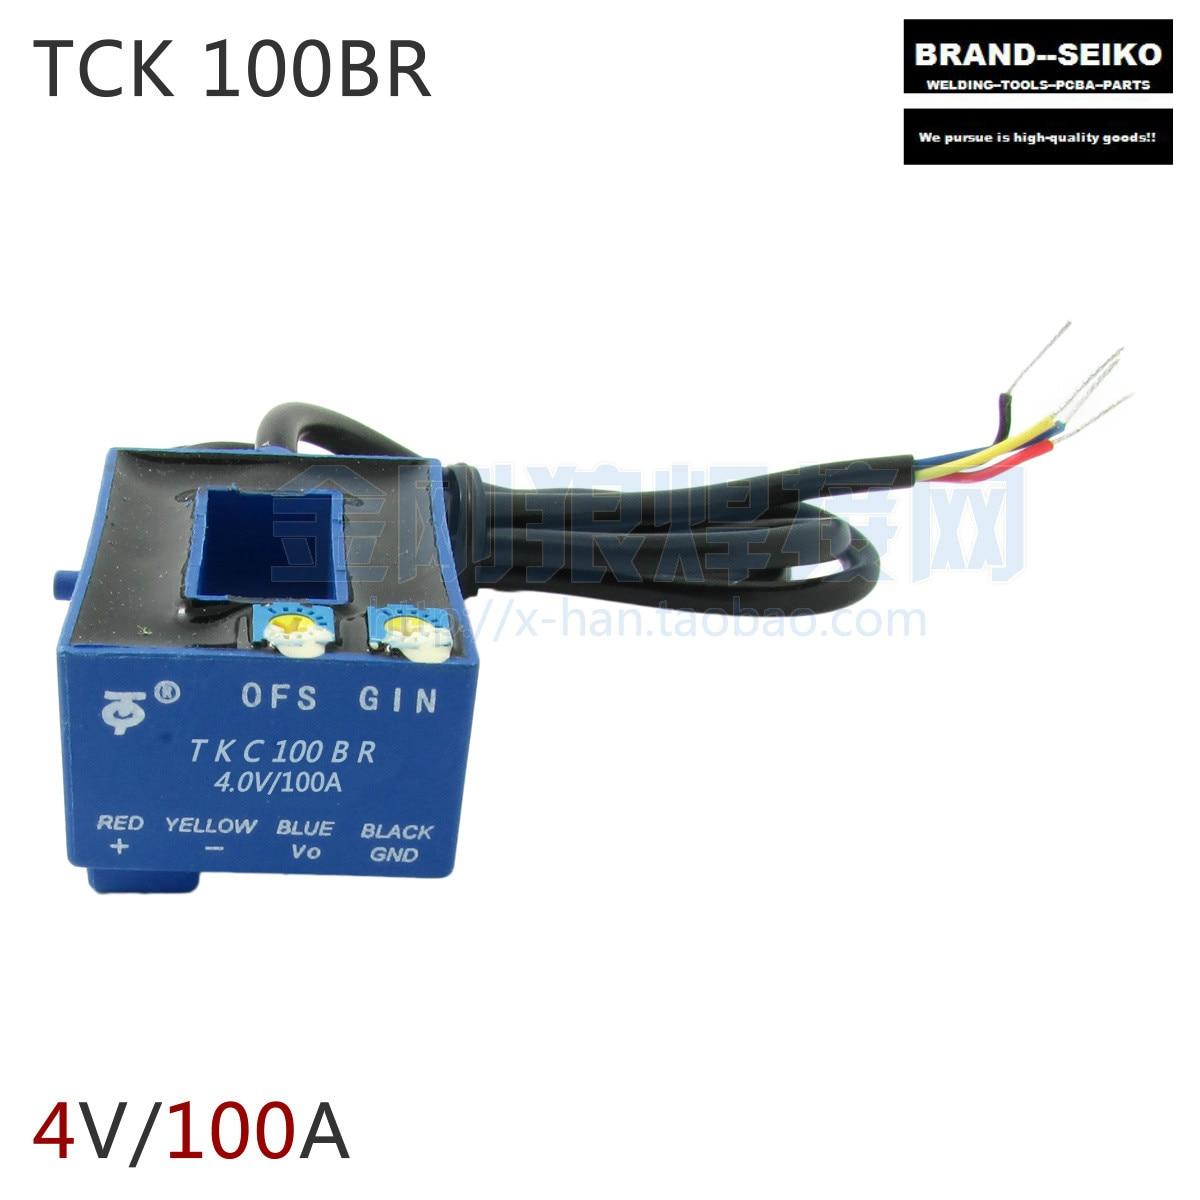 ФОТО 100br 4v 100a Tck Sensor Feedback Band Line